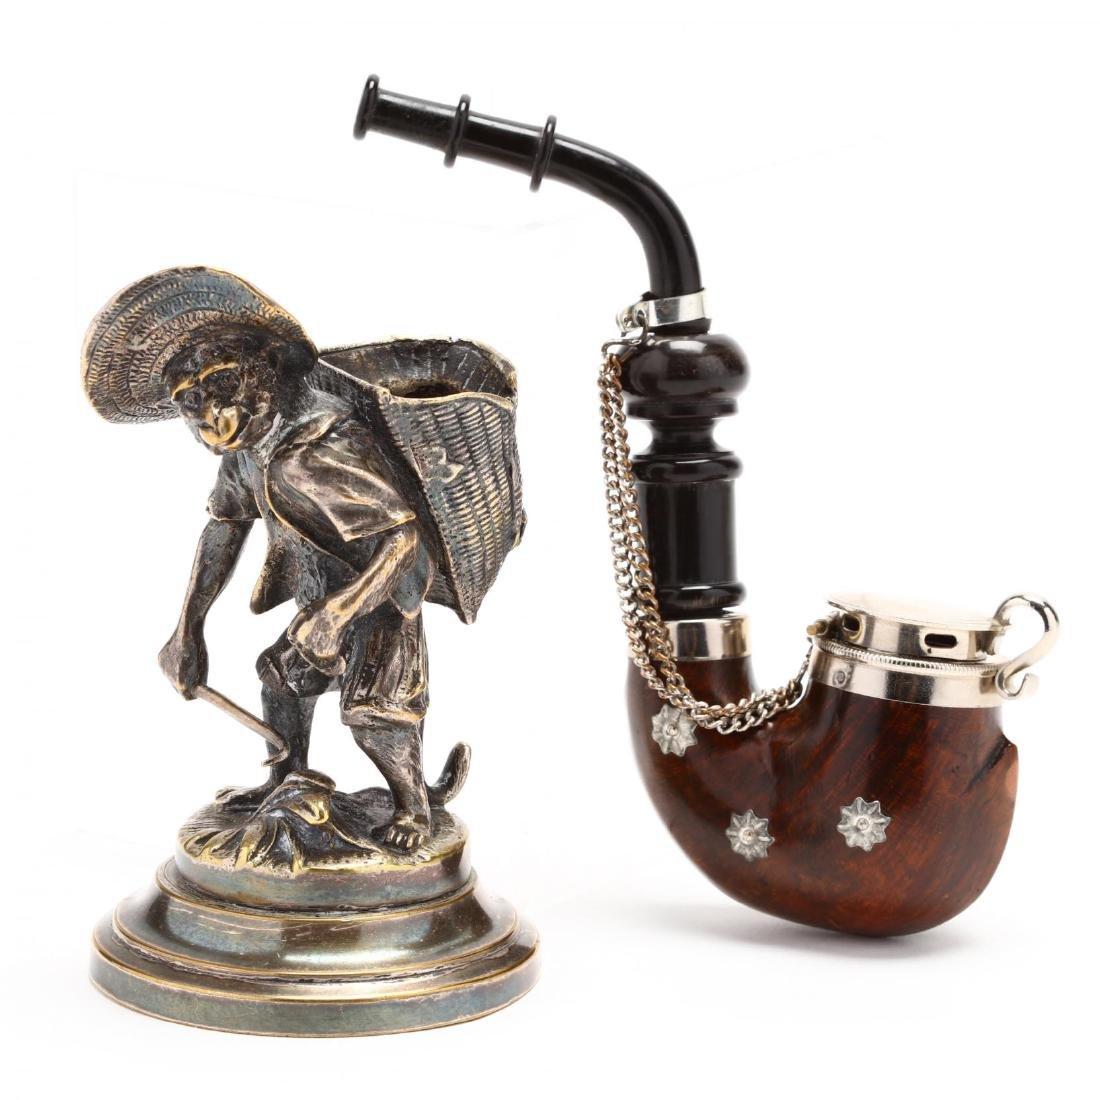 Antique and Vintage Gentleman's Pipe & Match Holder